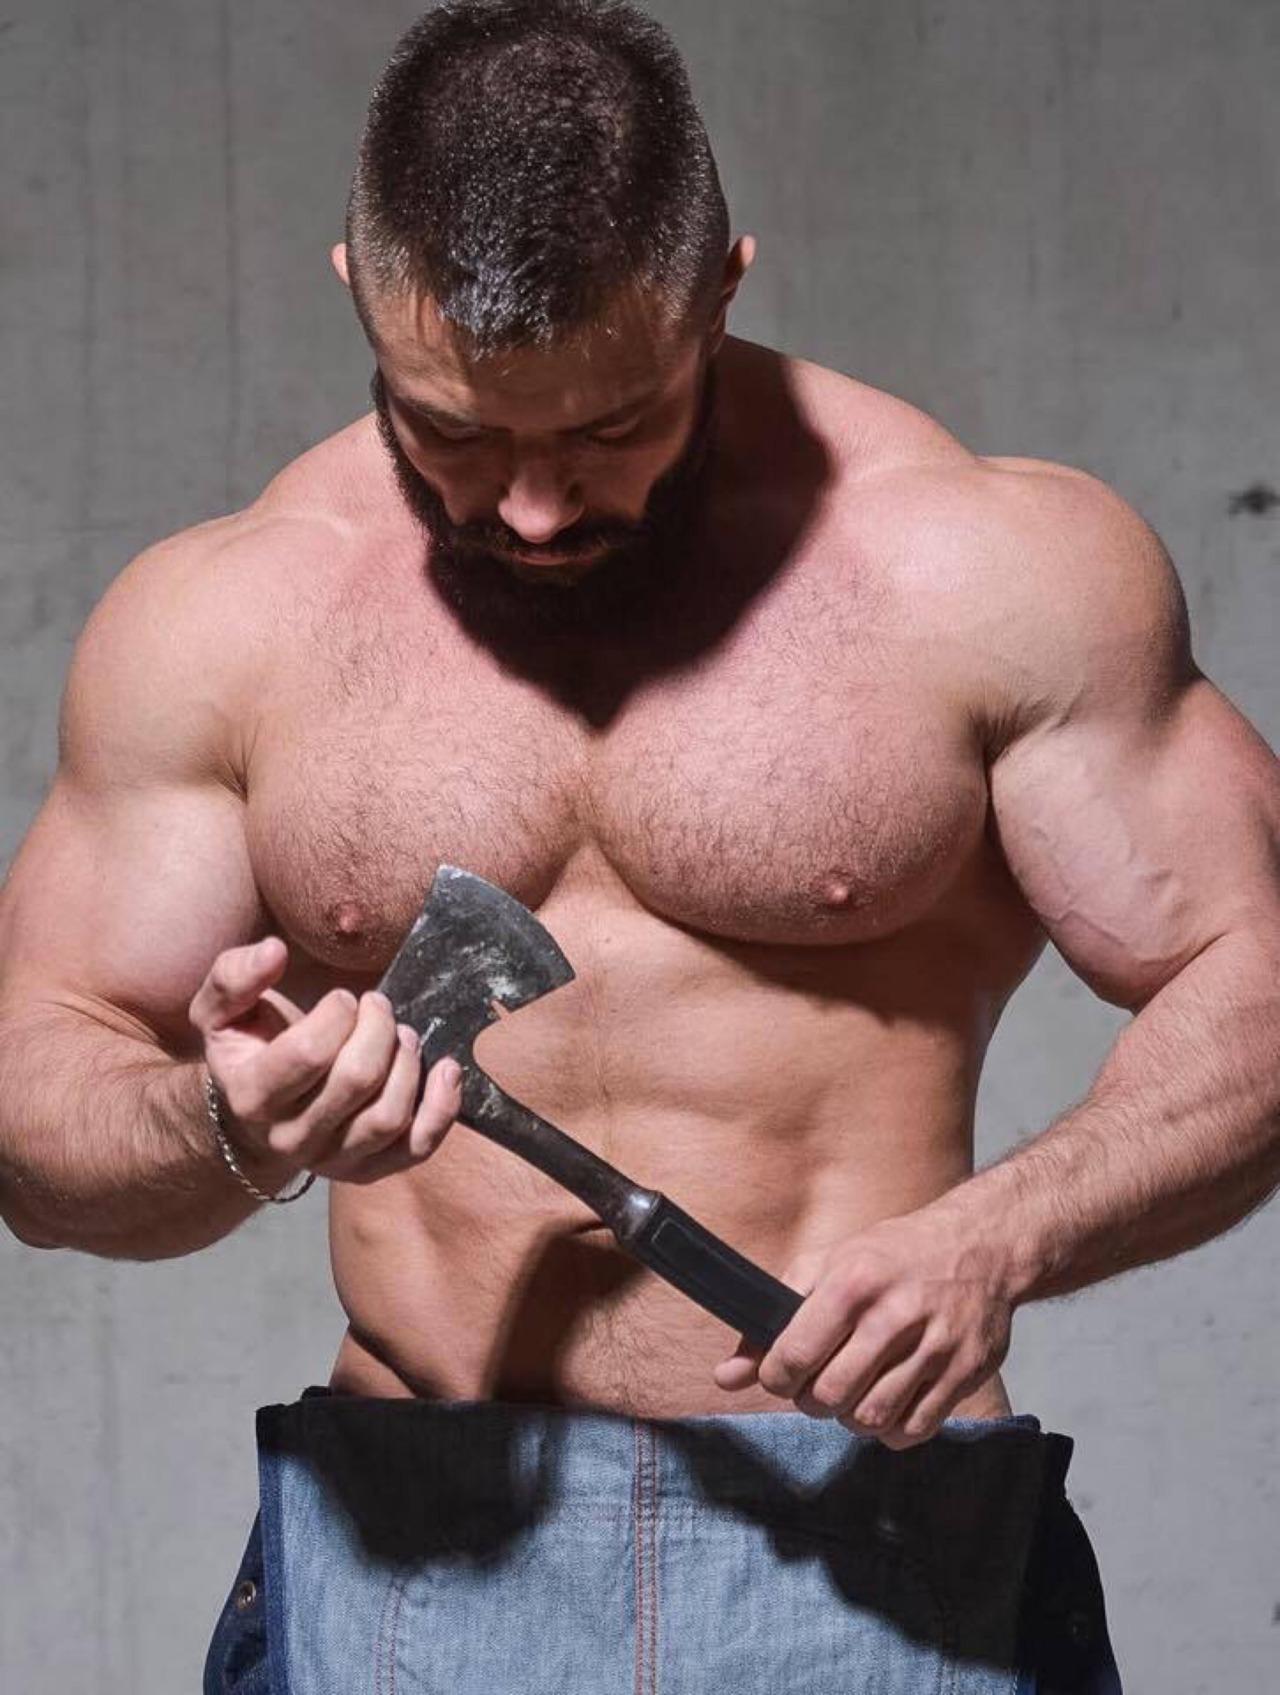 Leo Bartenev gay hot daddy dude men ripped